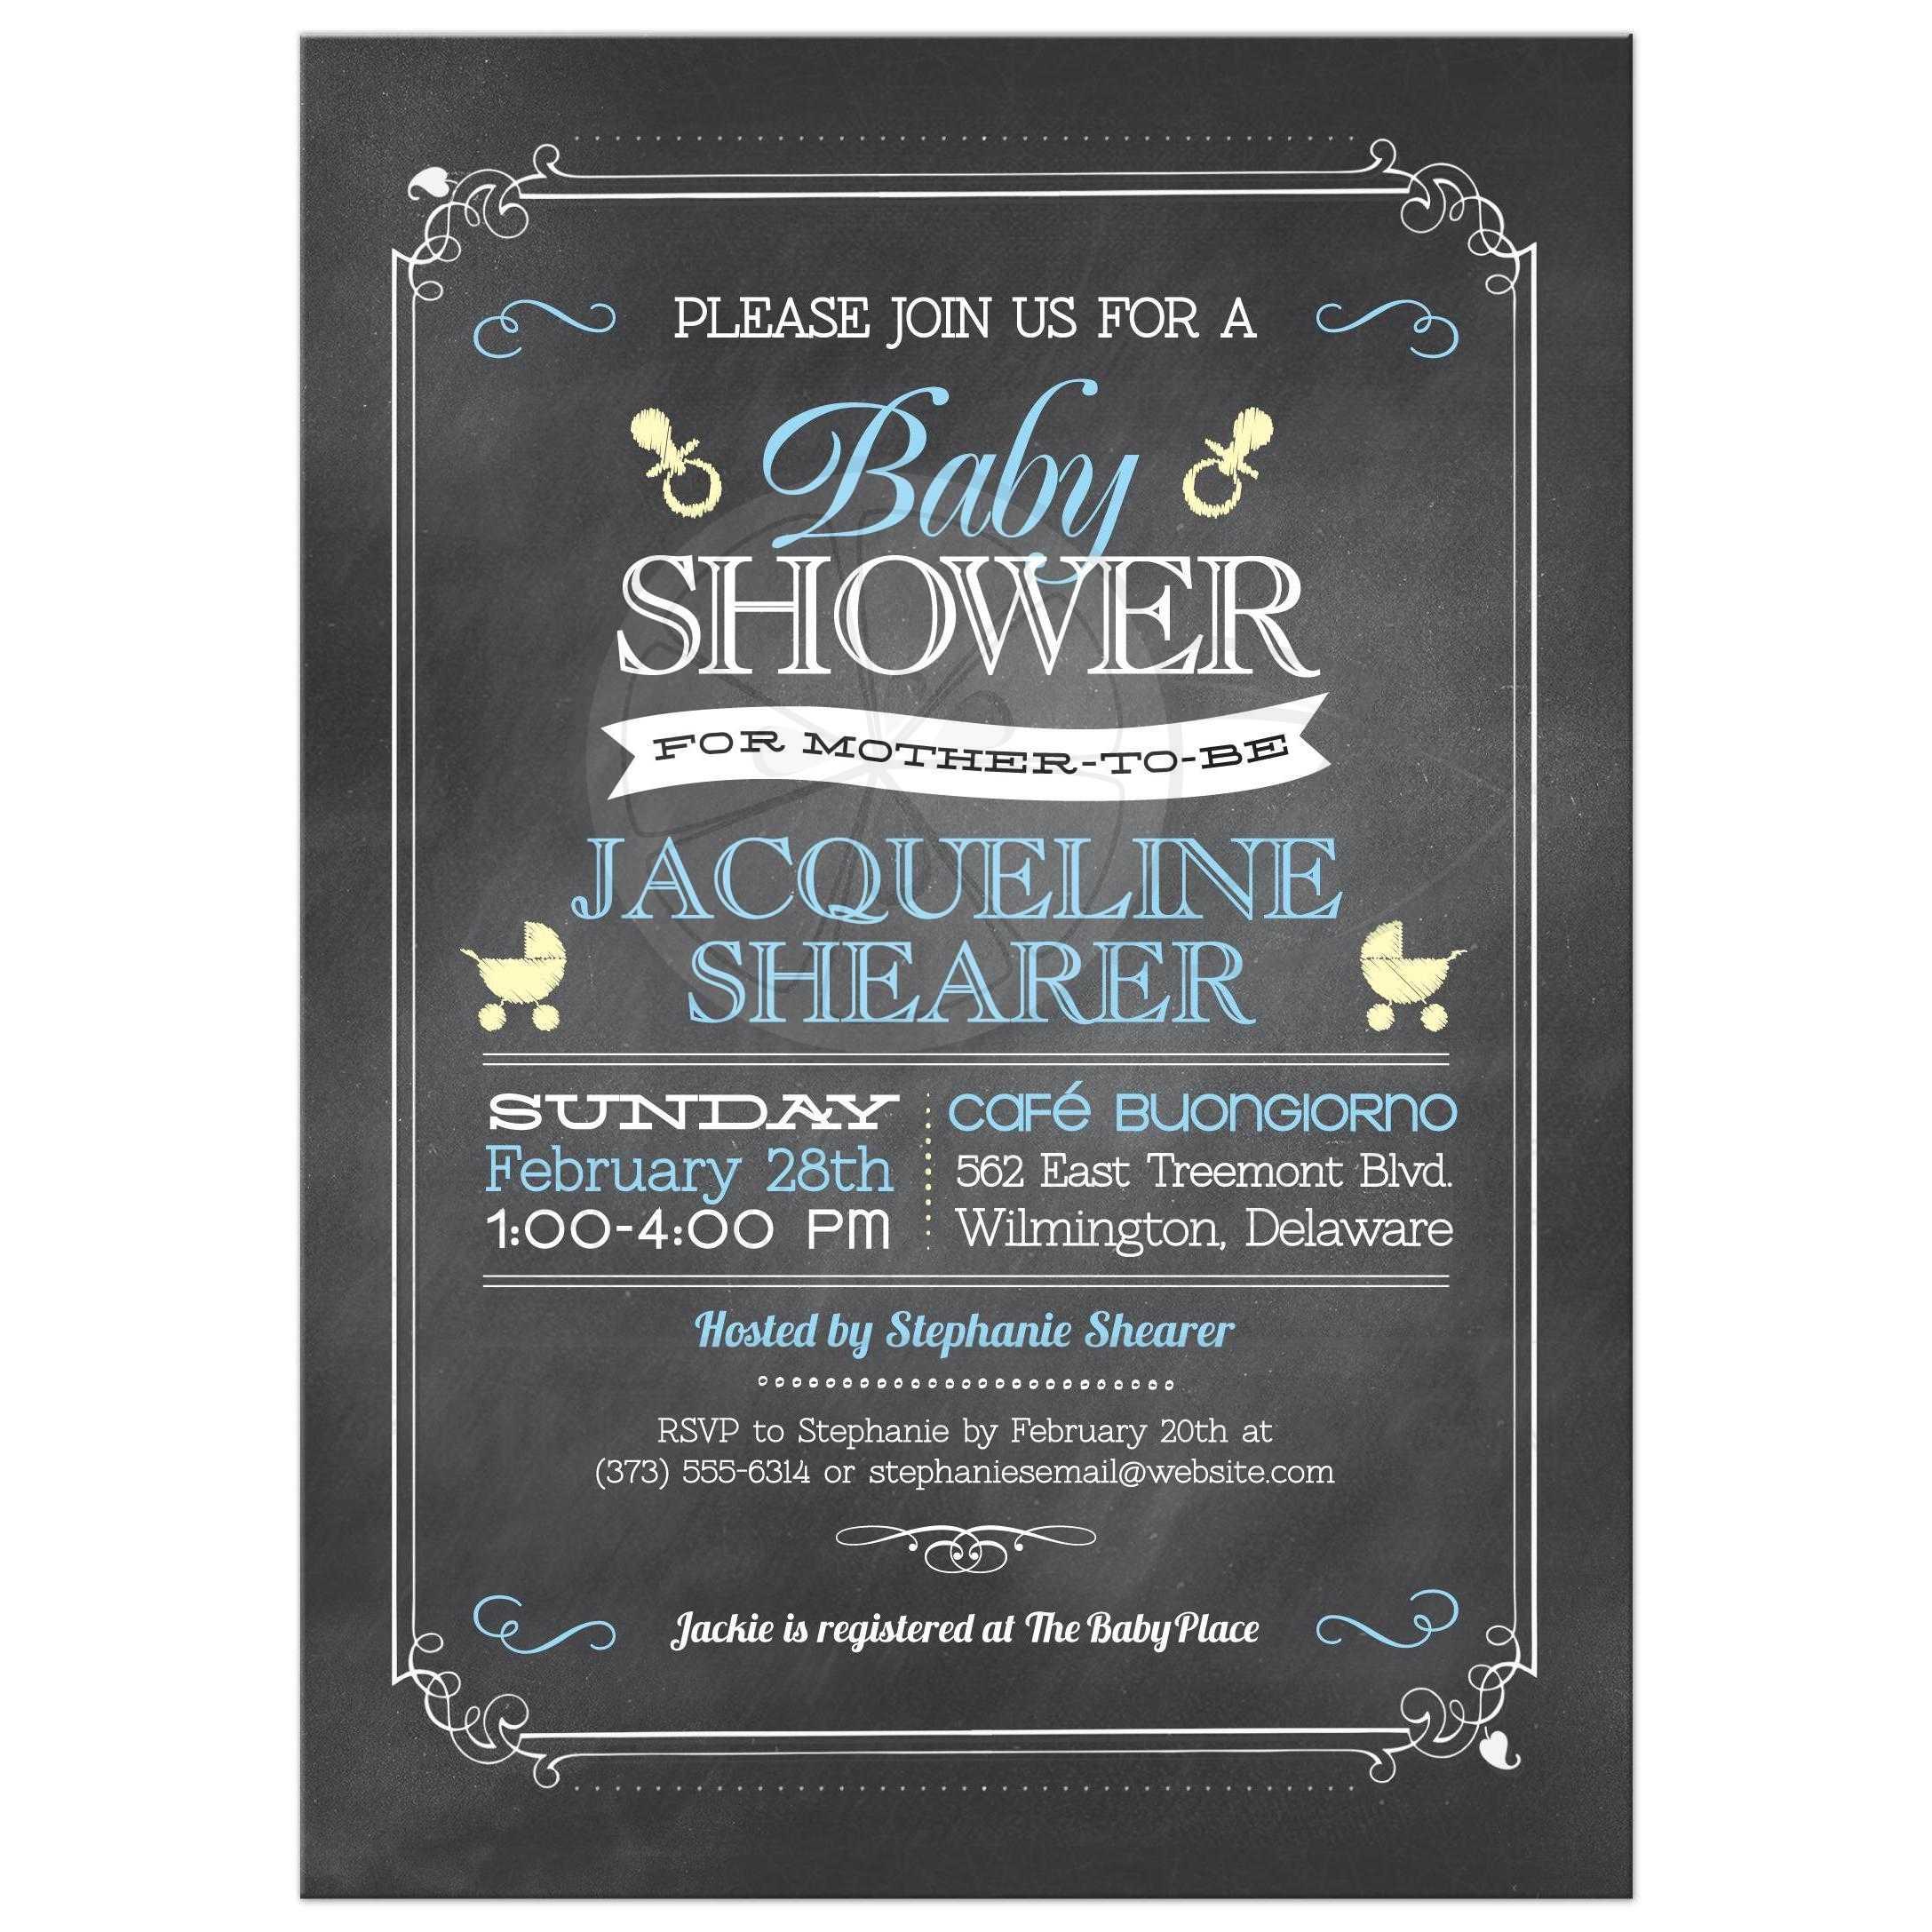 Baby shower invitation whimsical chalkboard blue whimsical chalkboard blue baby shower invitation filmwisefo